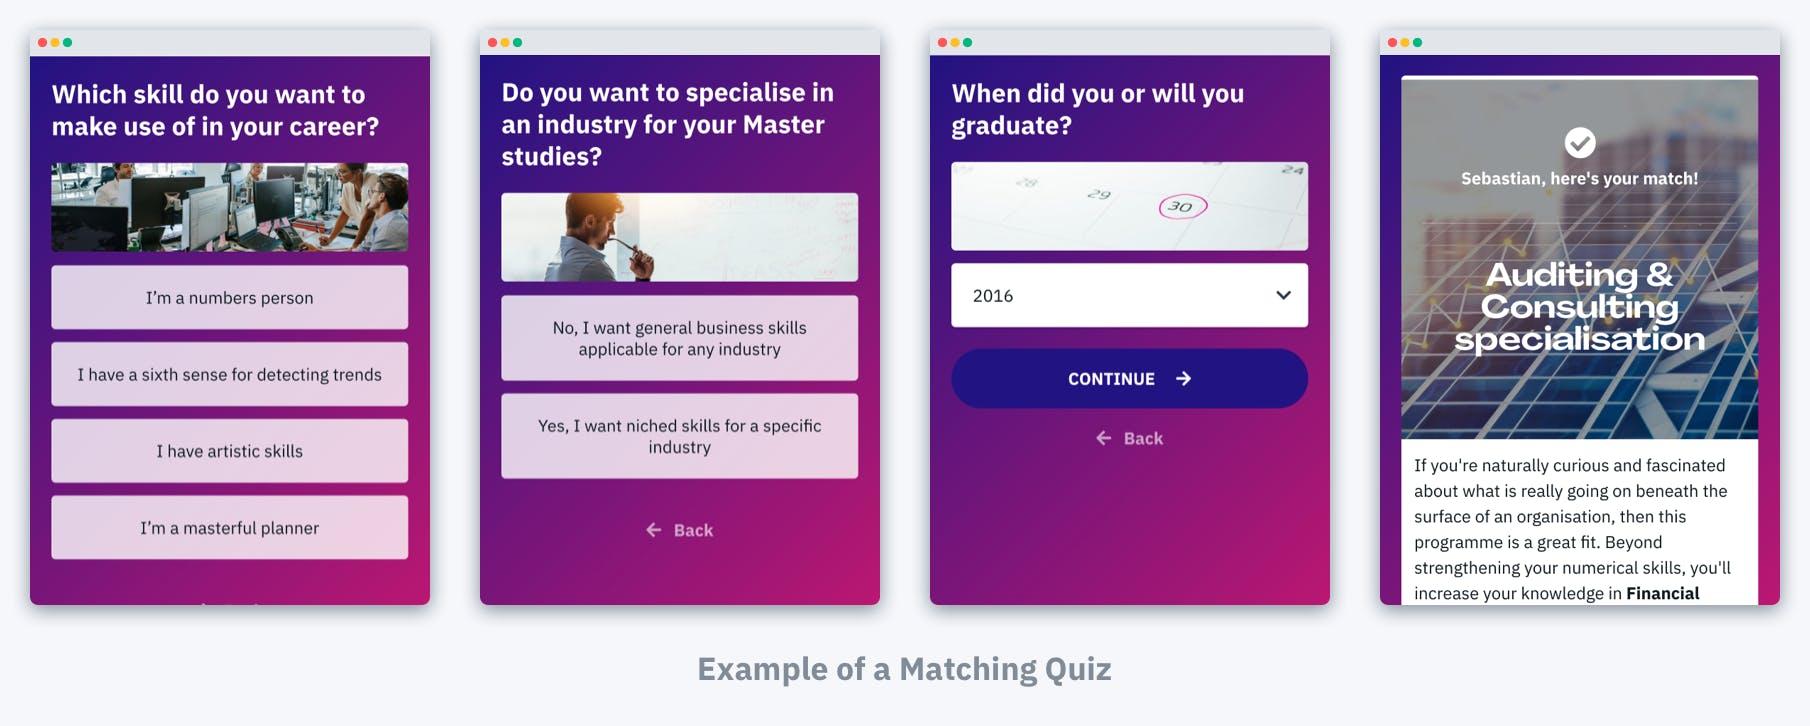 MBA Matching Quiz